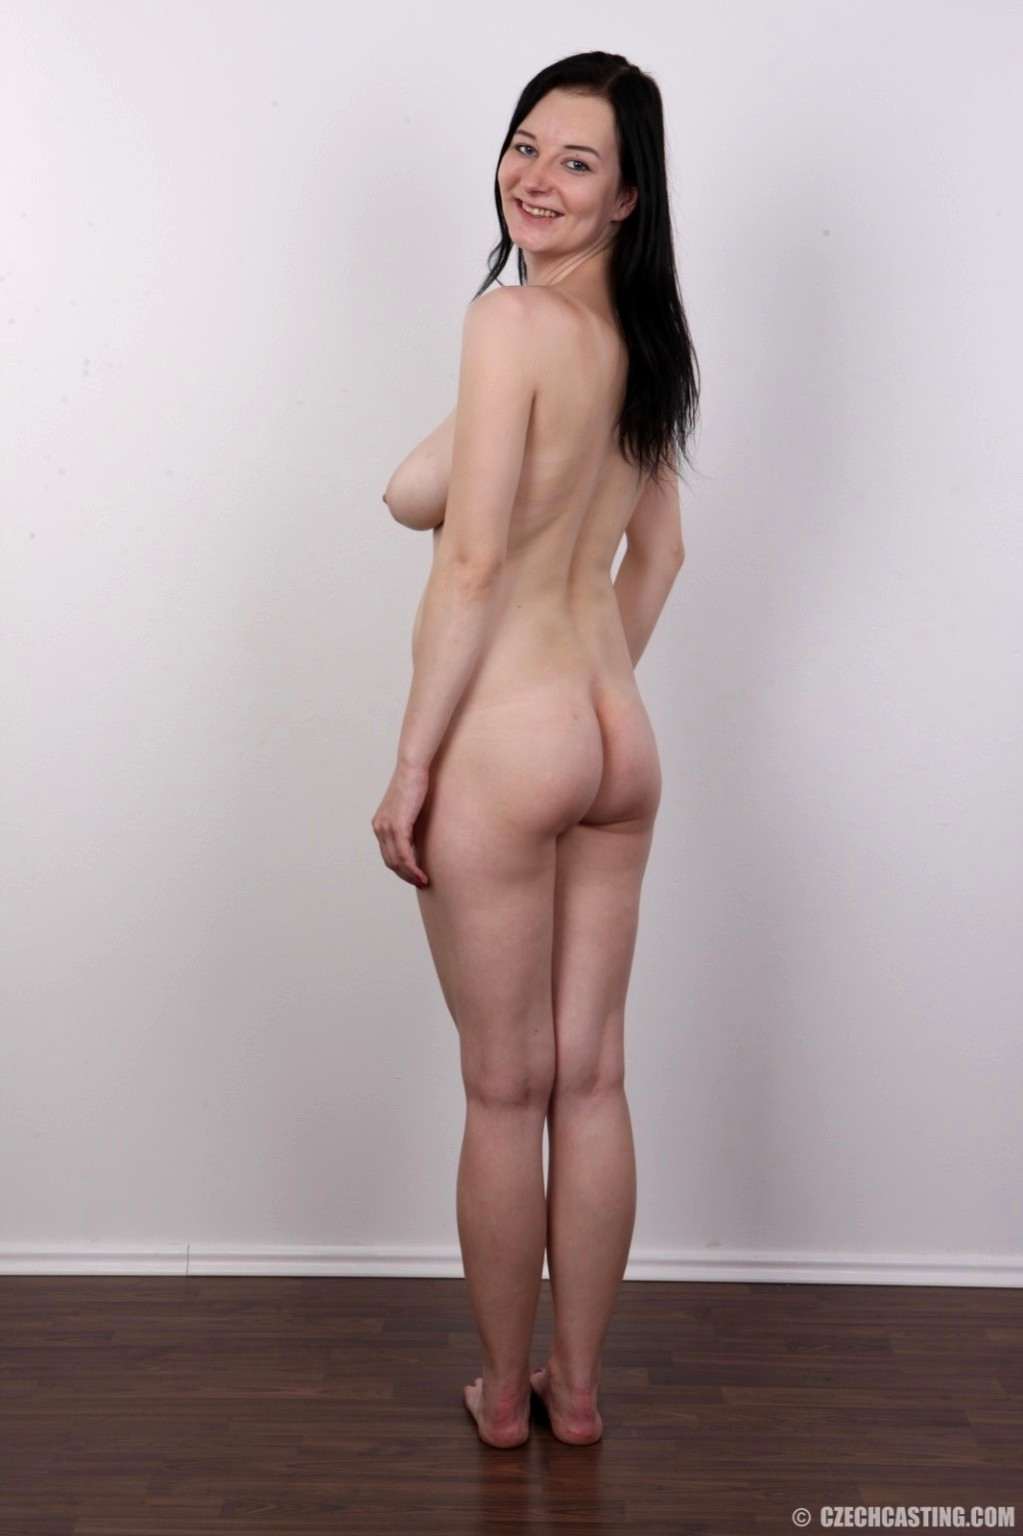 Tits big czech casting Czech casting